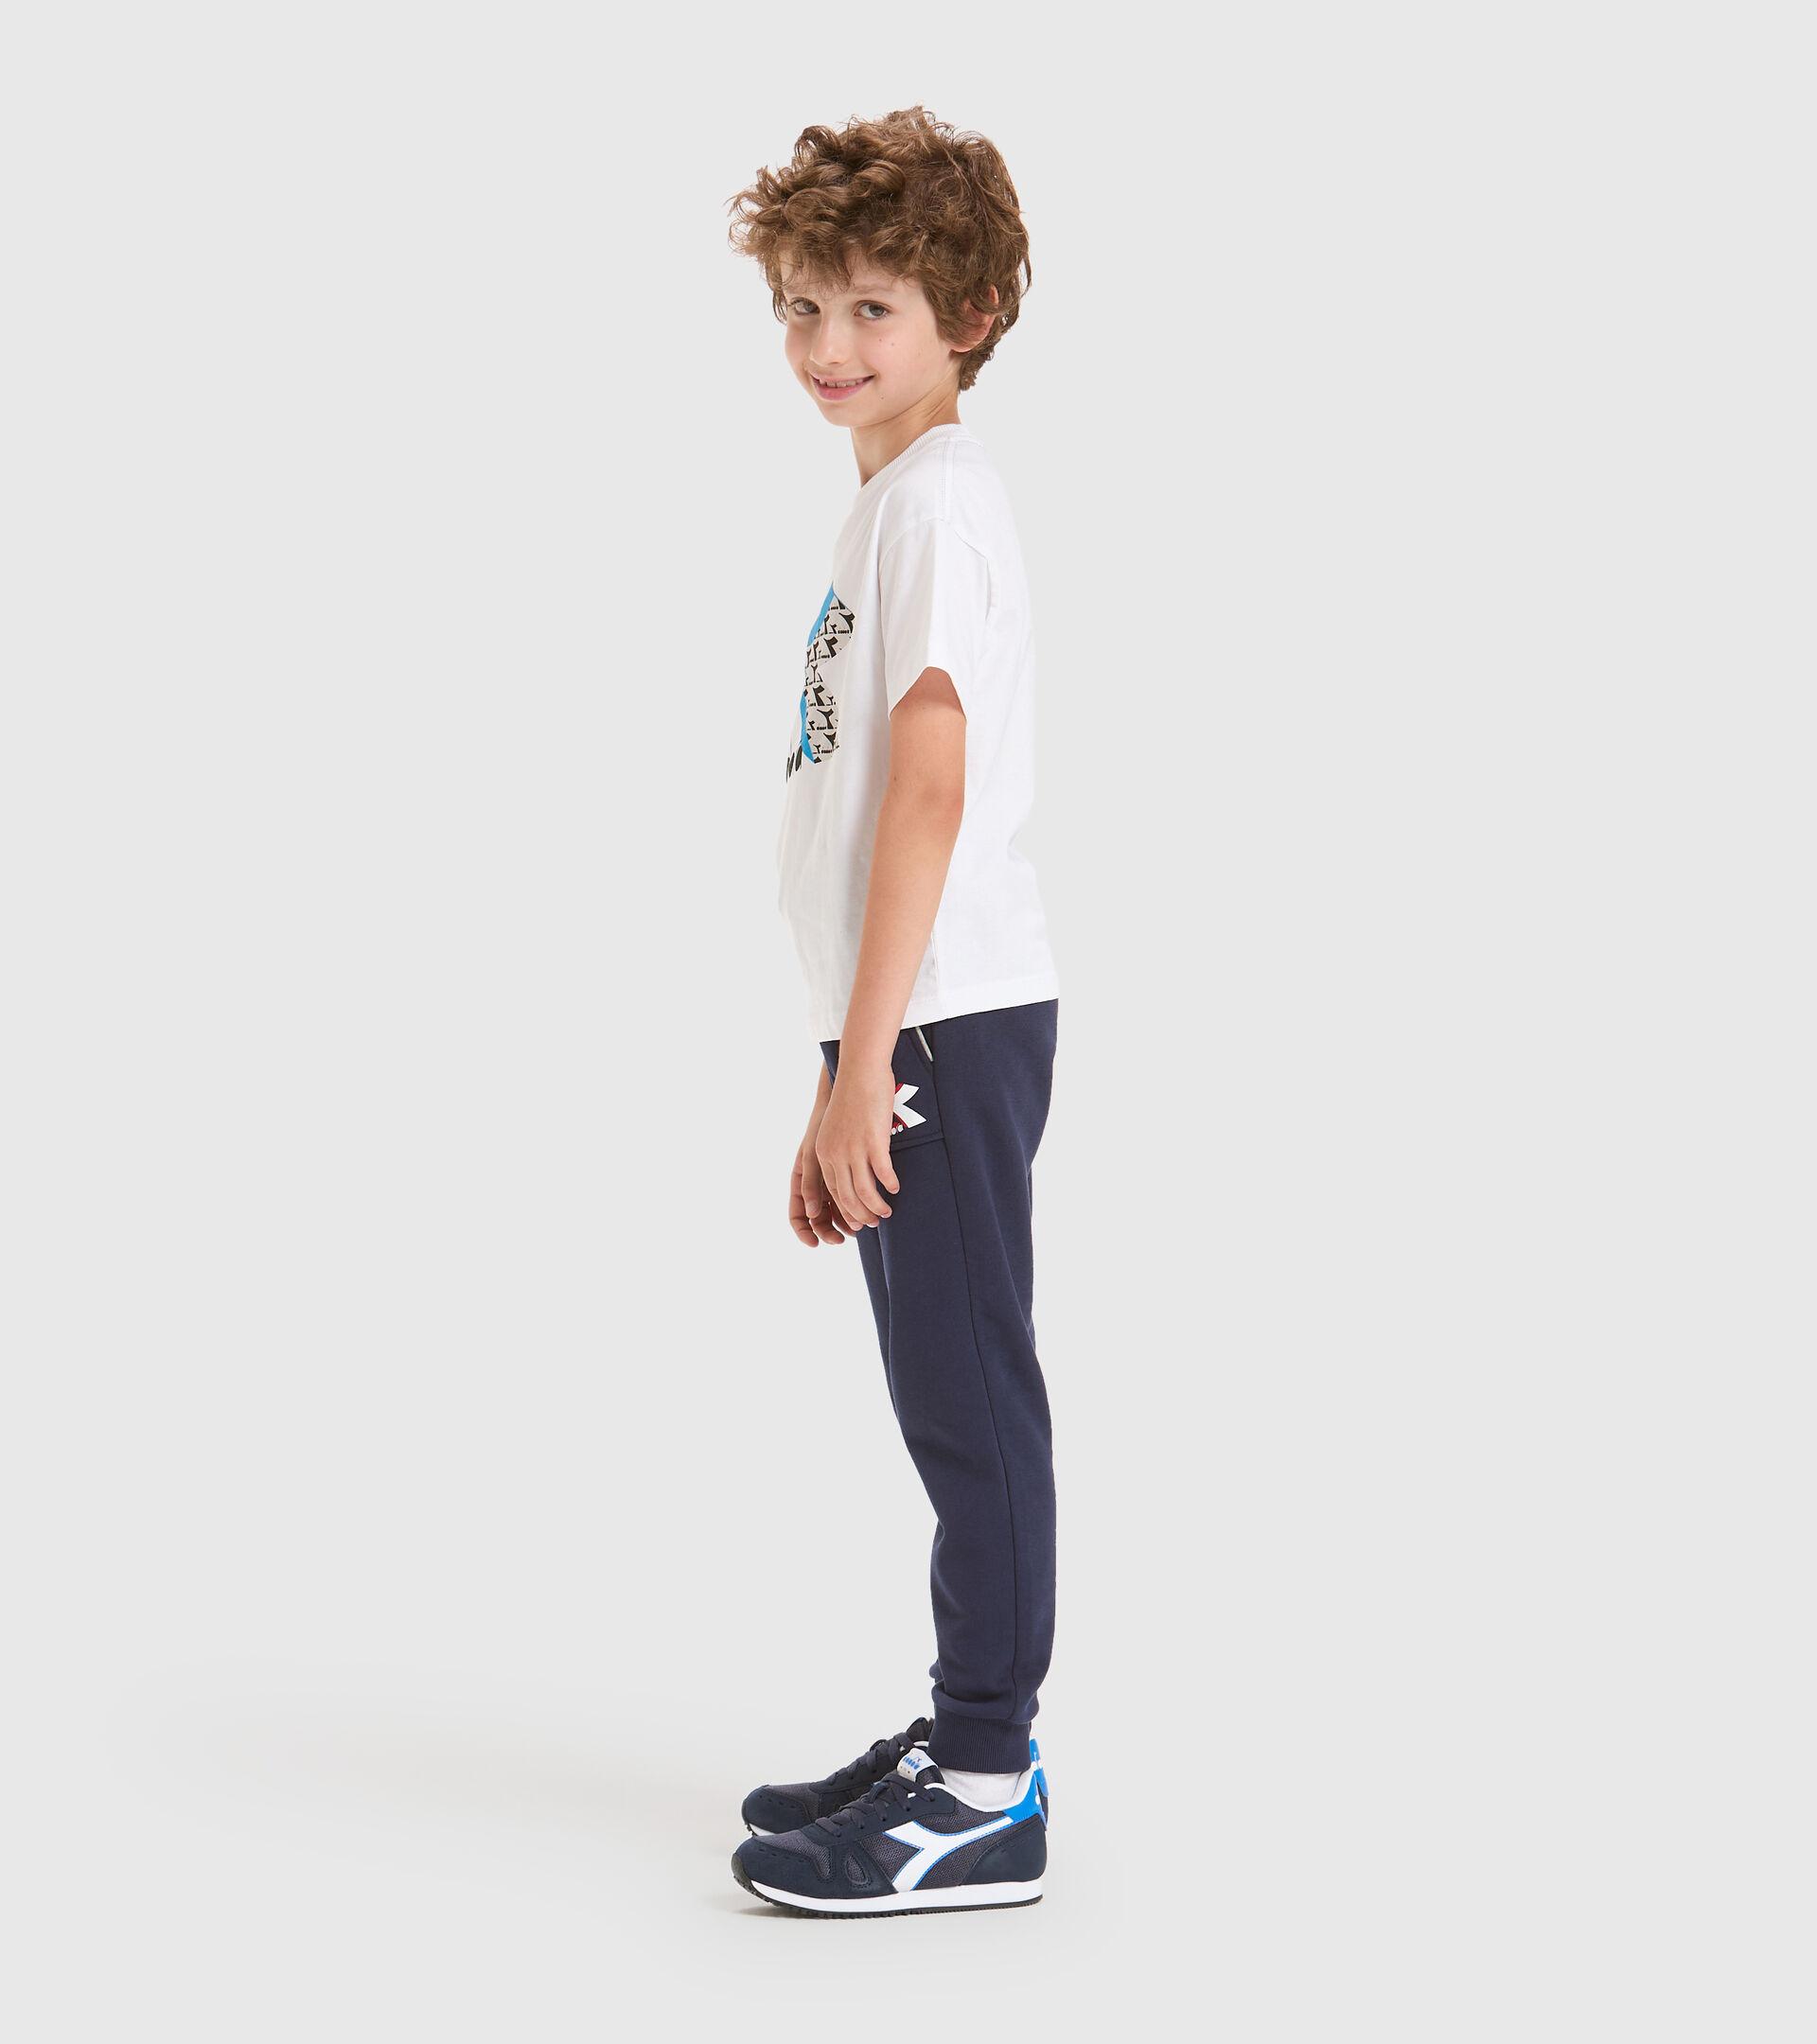 Sporthose - Kinder JU. CUFF PANTS CUBIC CABAN BLAU - Diadora